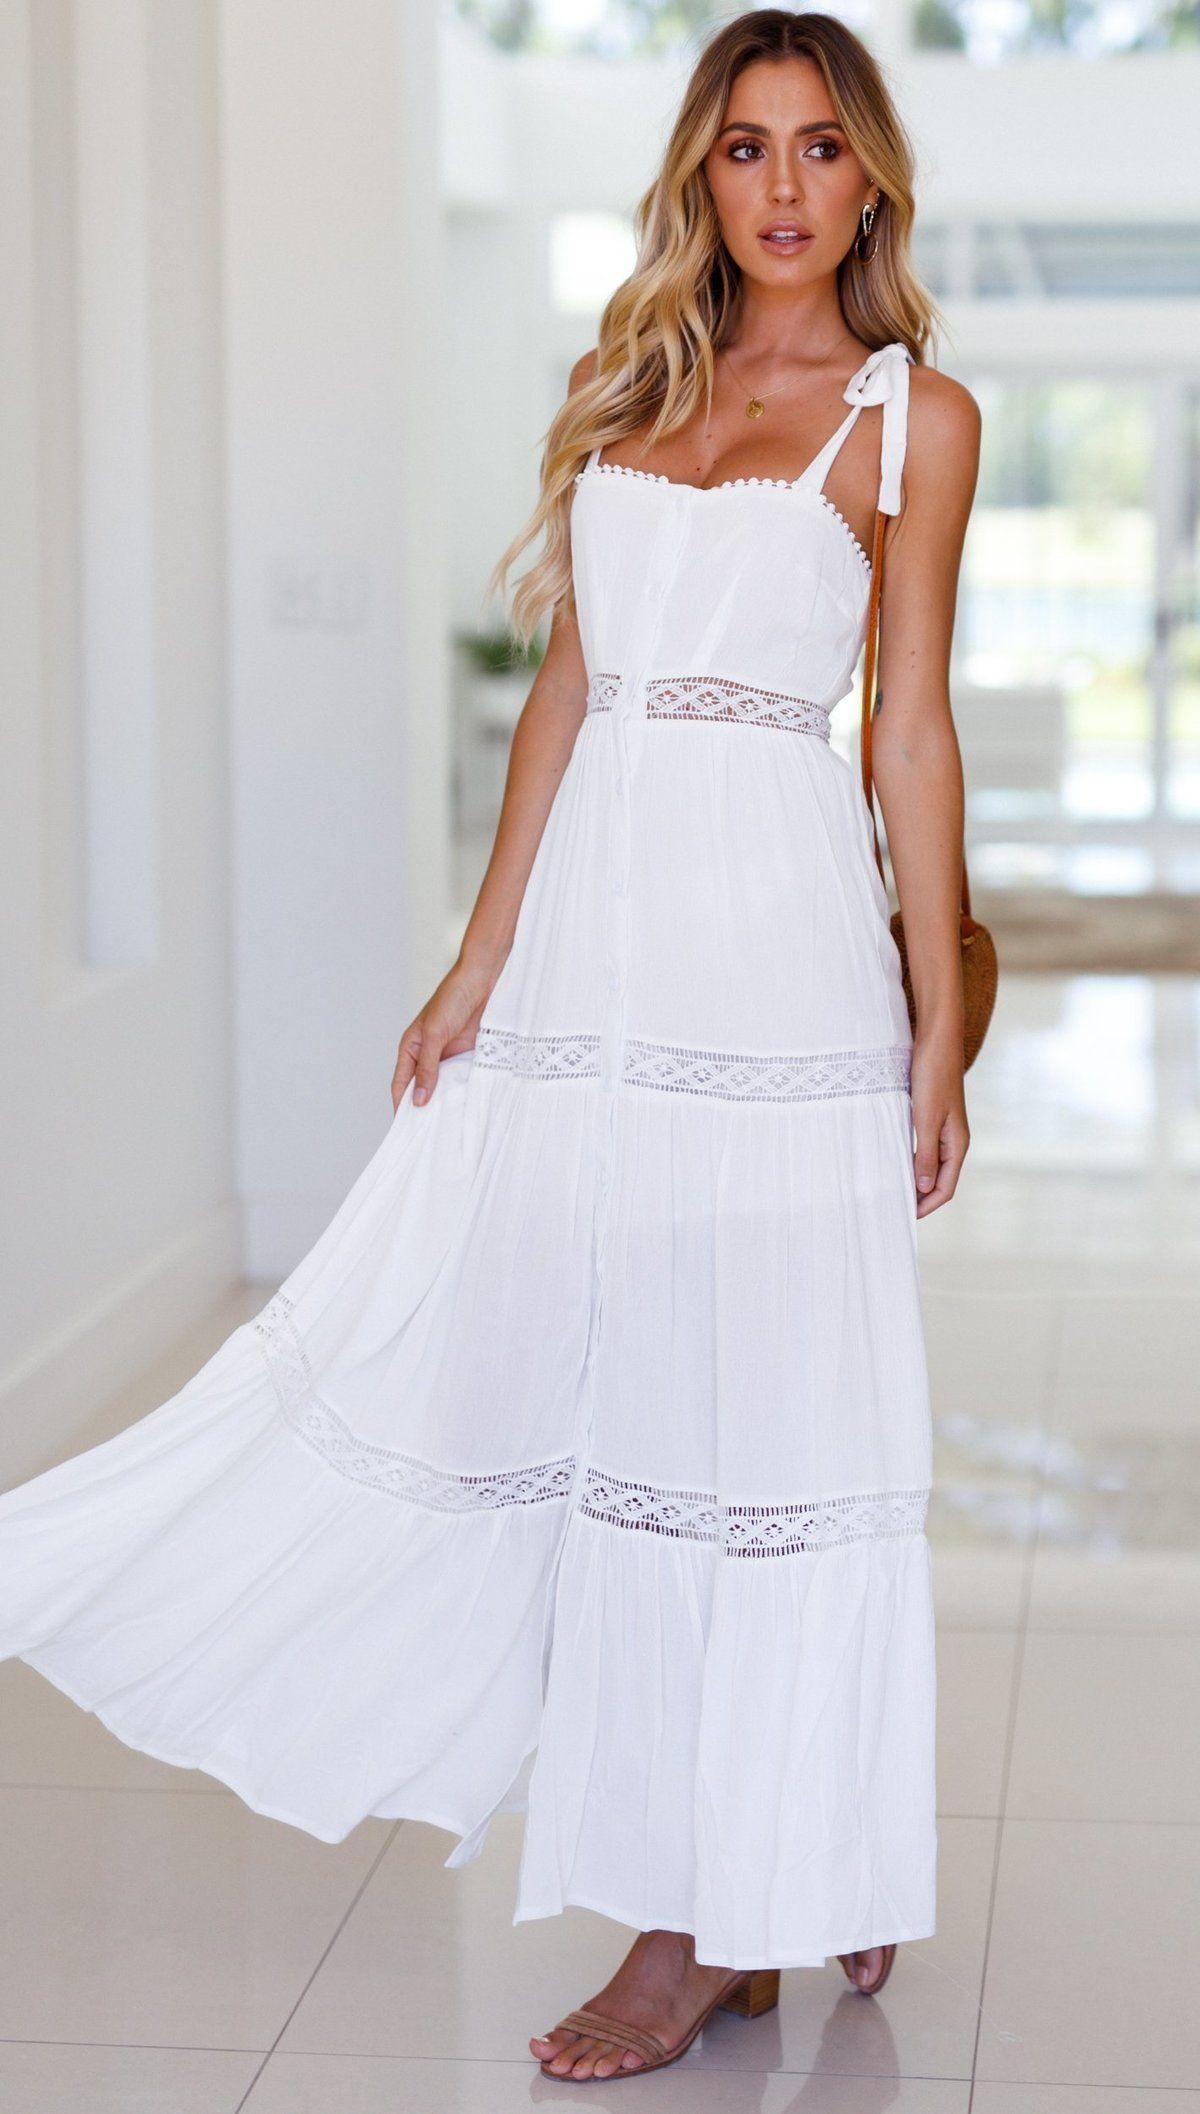 White Backless Maxi Dress White Backless Maxi Dress Beige Bridesmaid Dress Vinyl Dress [ 2114 x 1200 Pixel ]